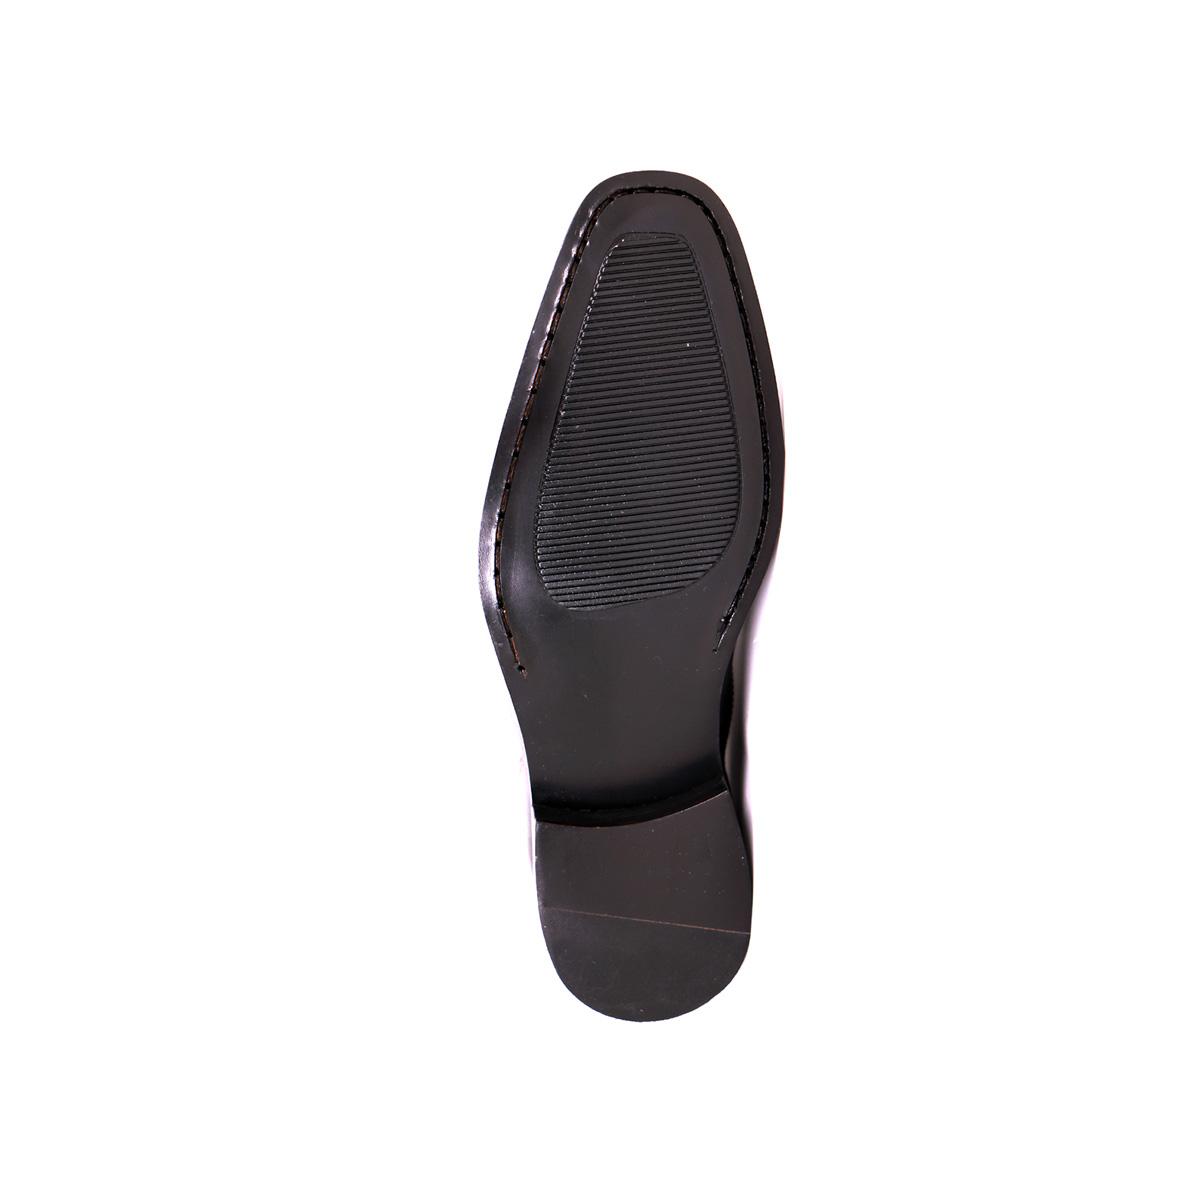 Botín Formal Lord Negro Max Denegri +7cms de Altura_73426